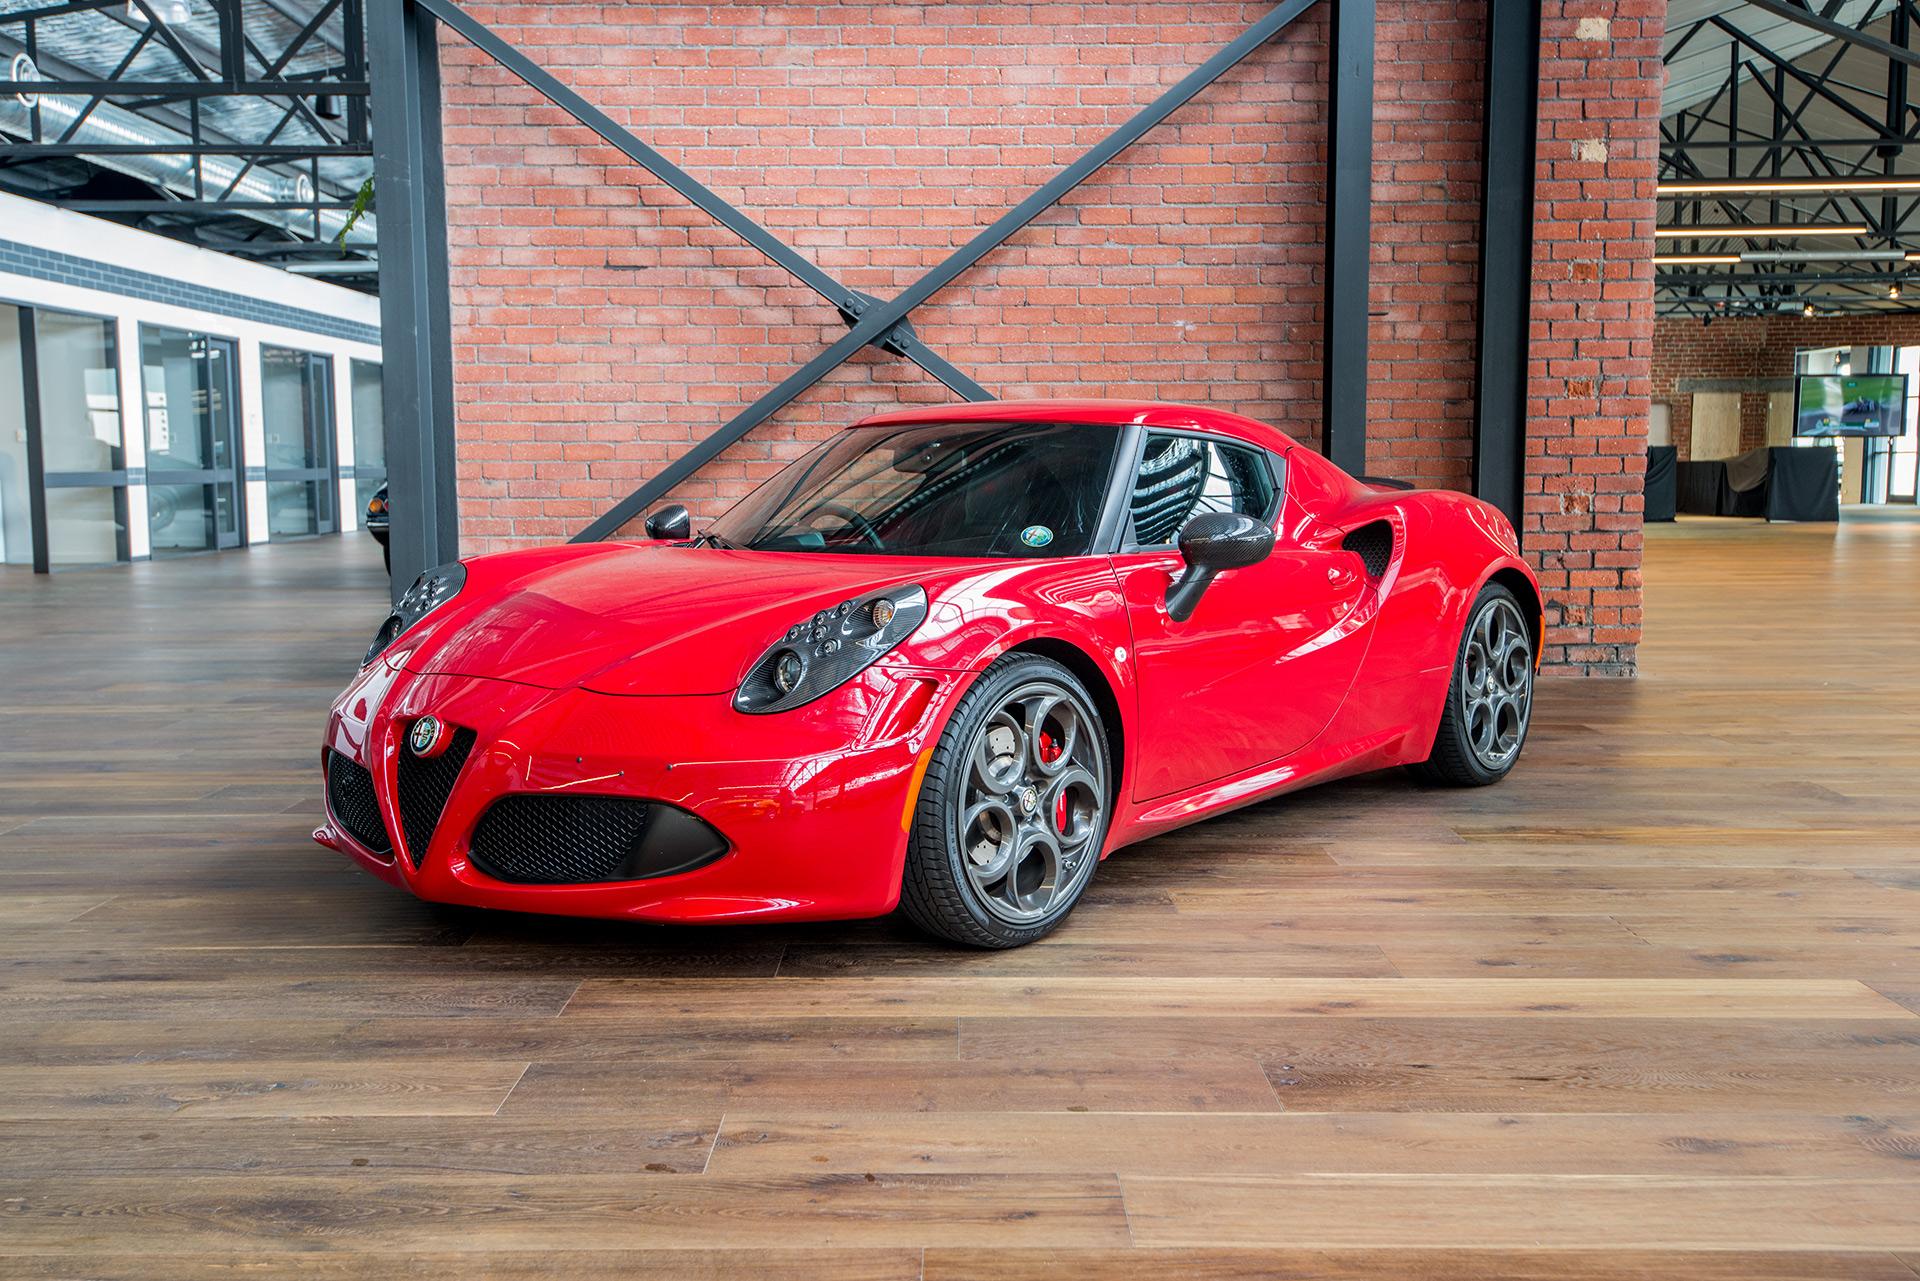 Alfa Romeo 4C >> 2014 Alfa Romeo 4C Launch Edition - Richmonds - Classic ...